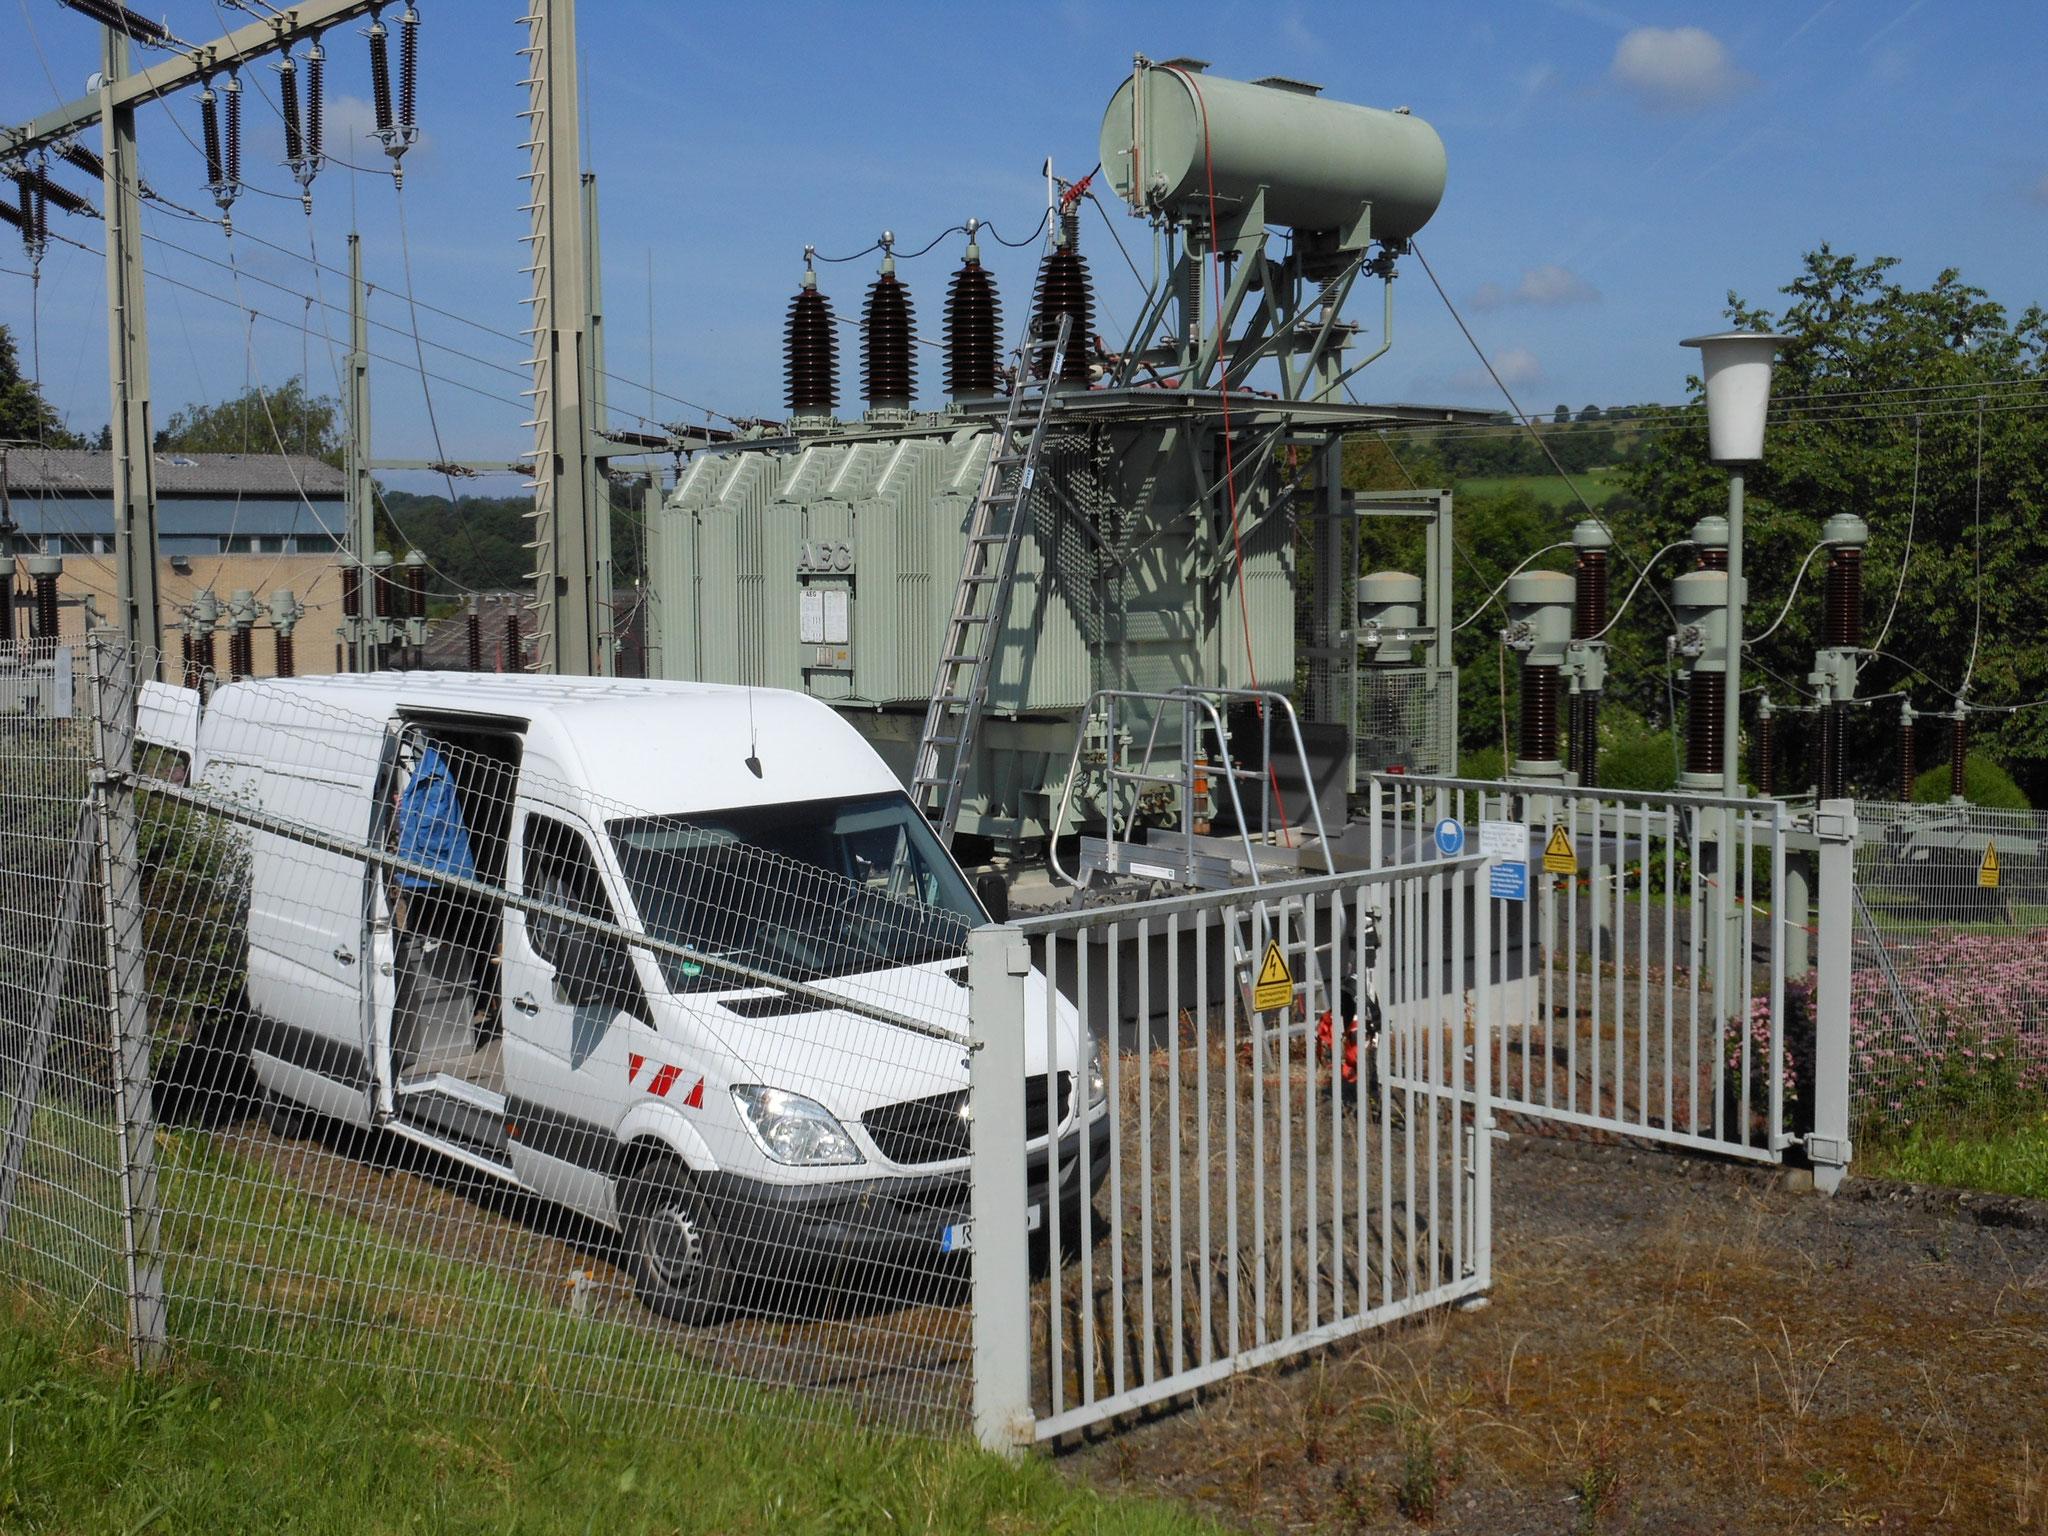 Alterungsdiagnose am 110 kV-Netztransformator (20/24 MVA) von 1969